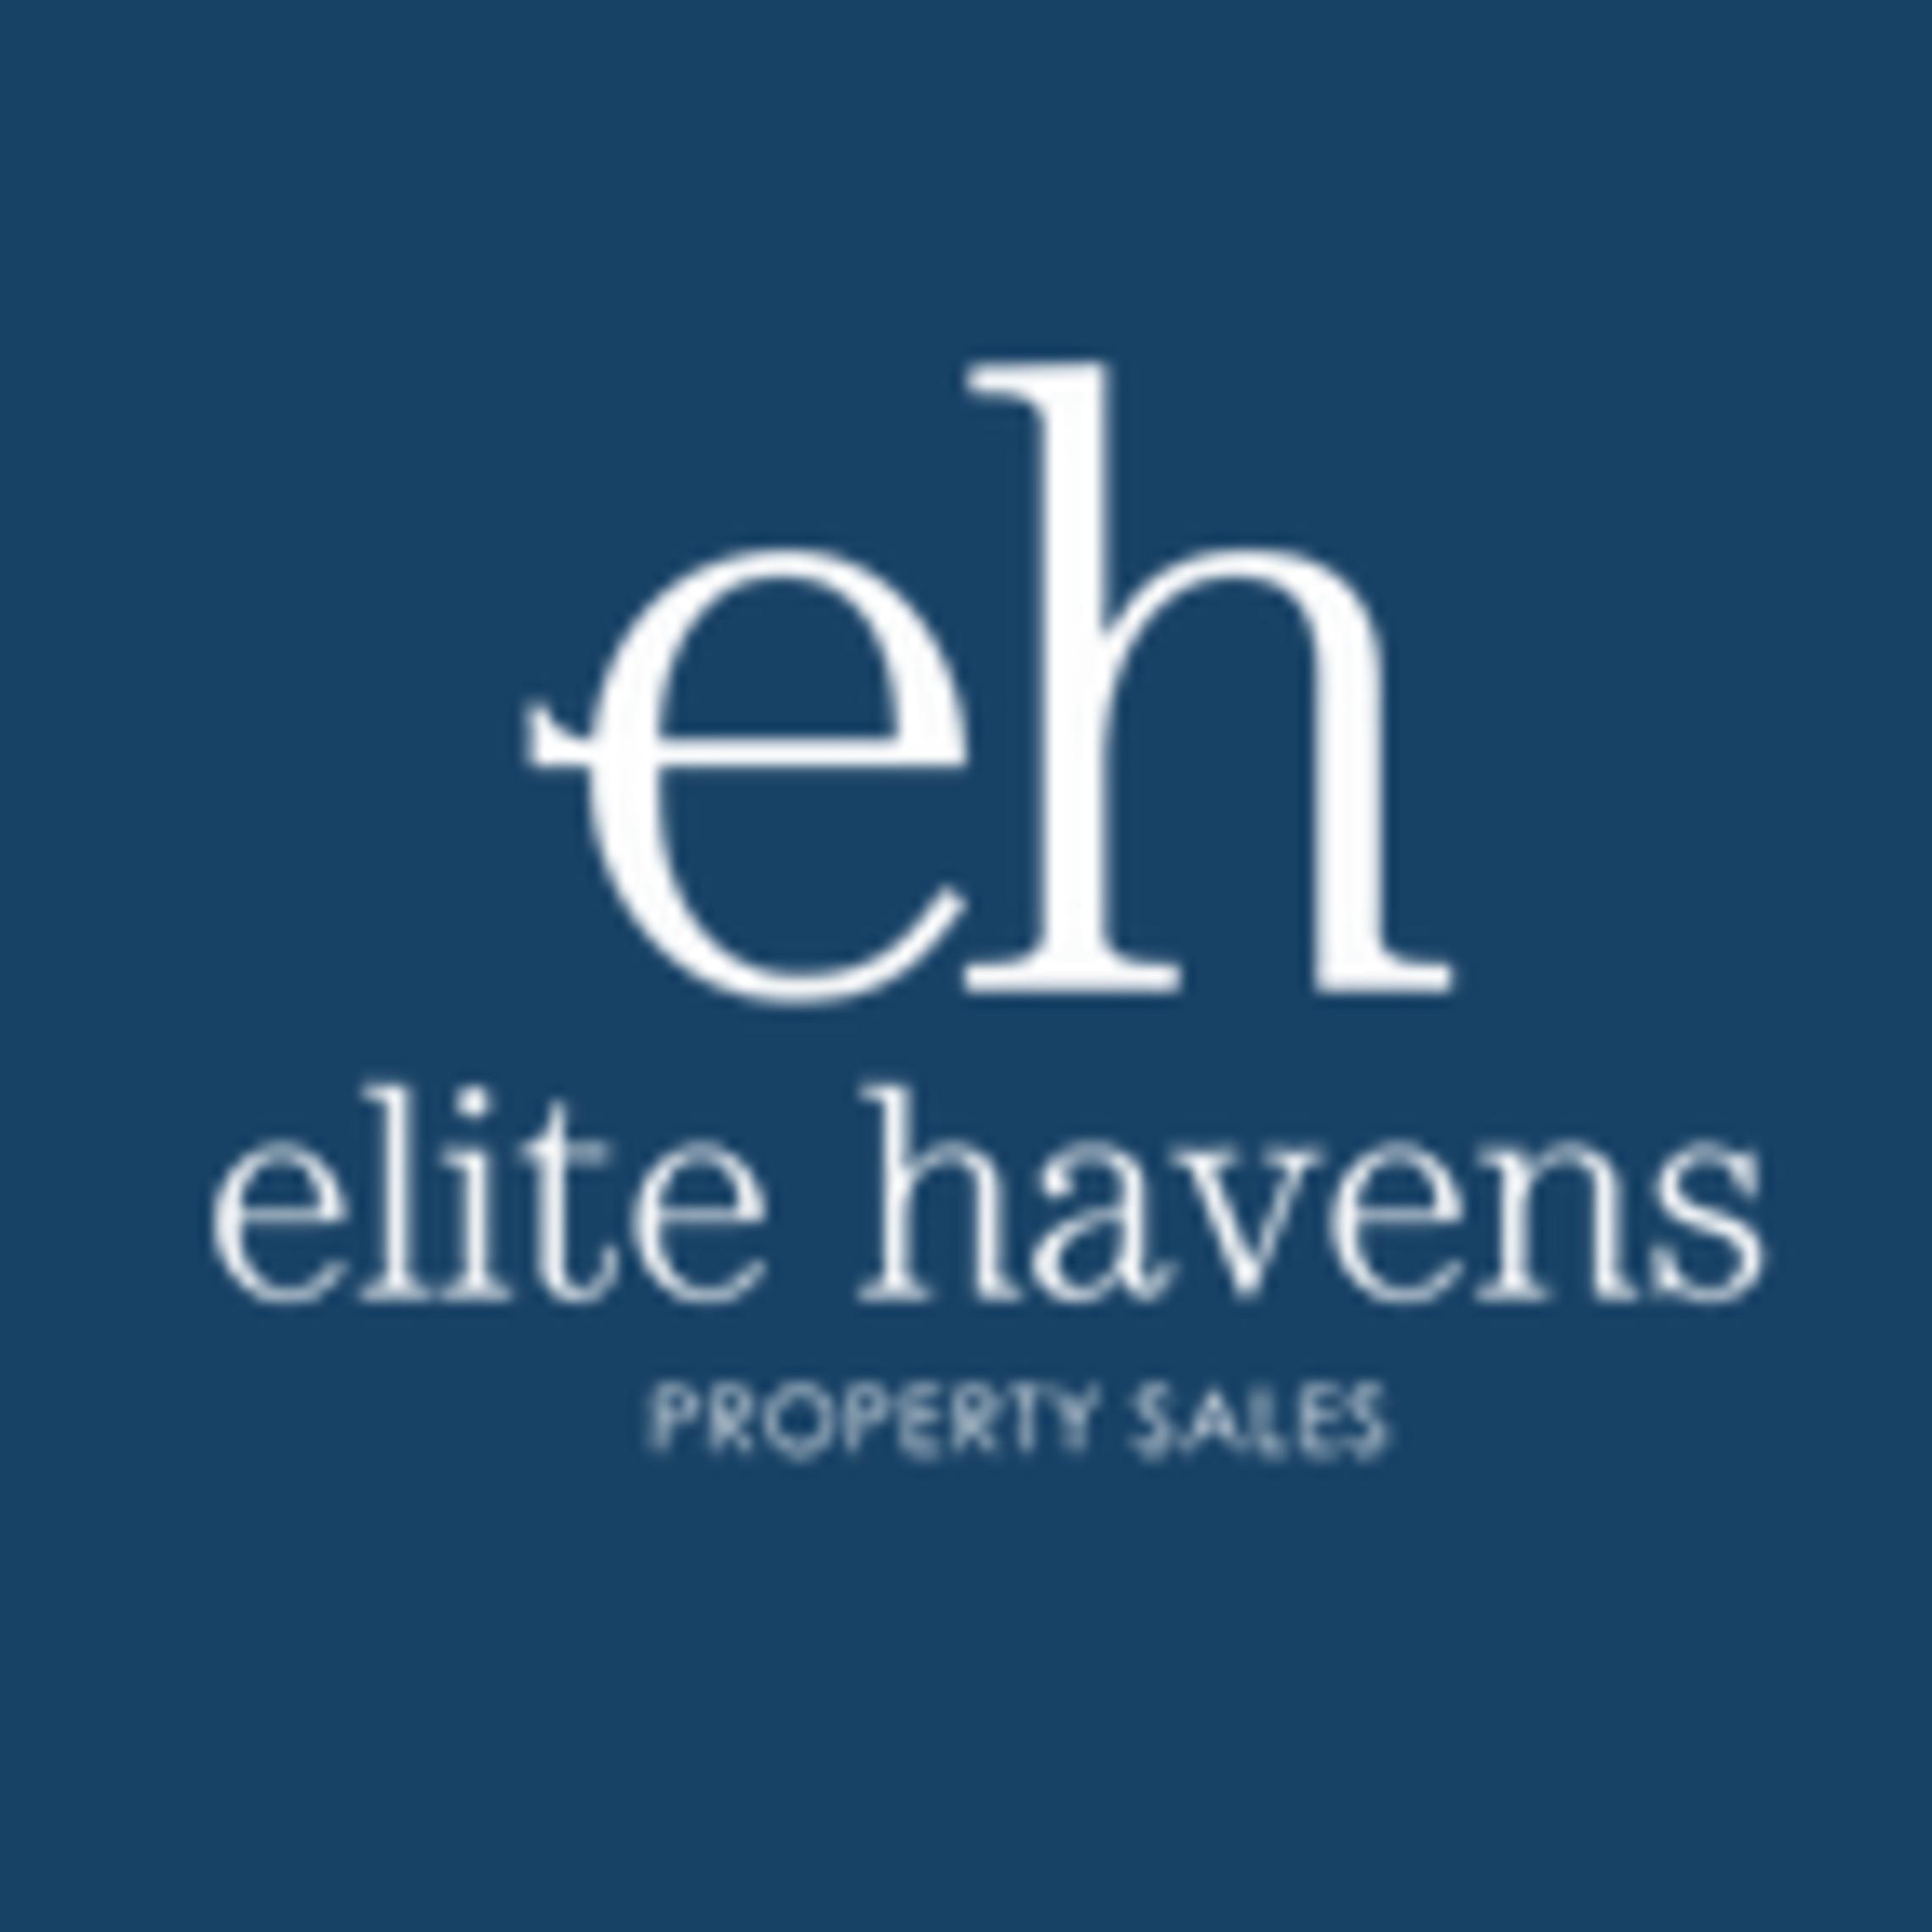 elite havens sales- company logo